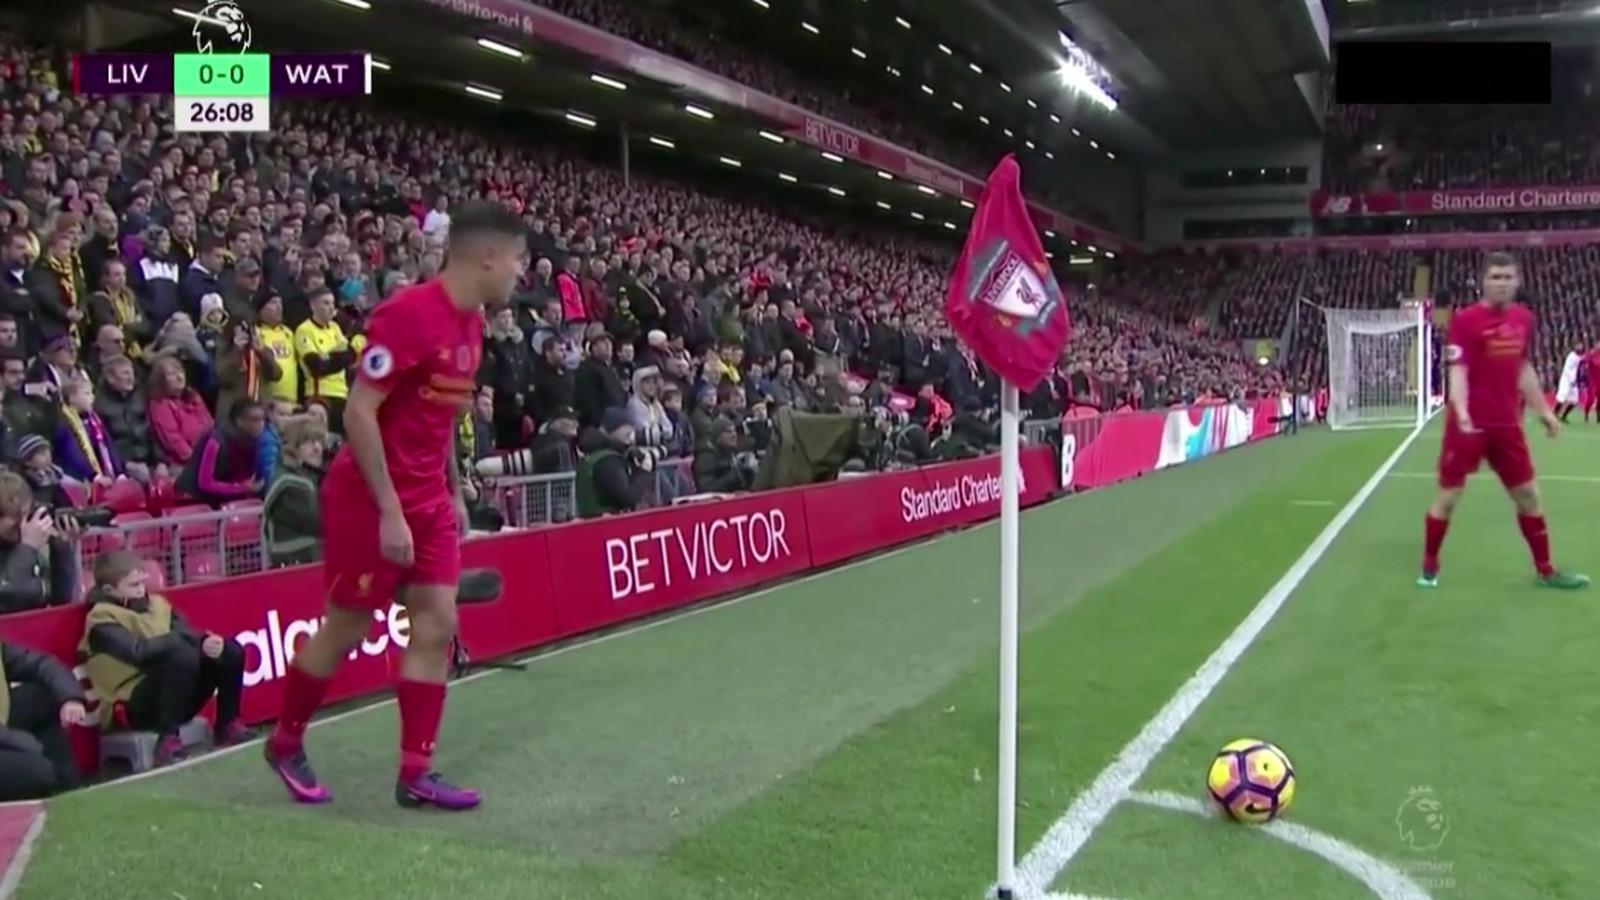 Watch Coutinho Mane Execute Perfect Corner Kick Routine